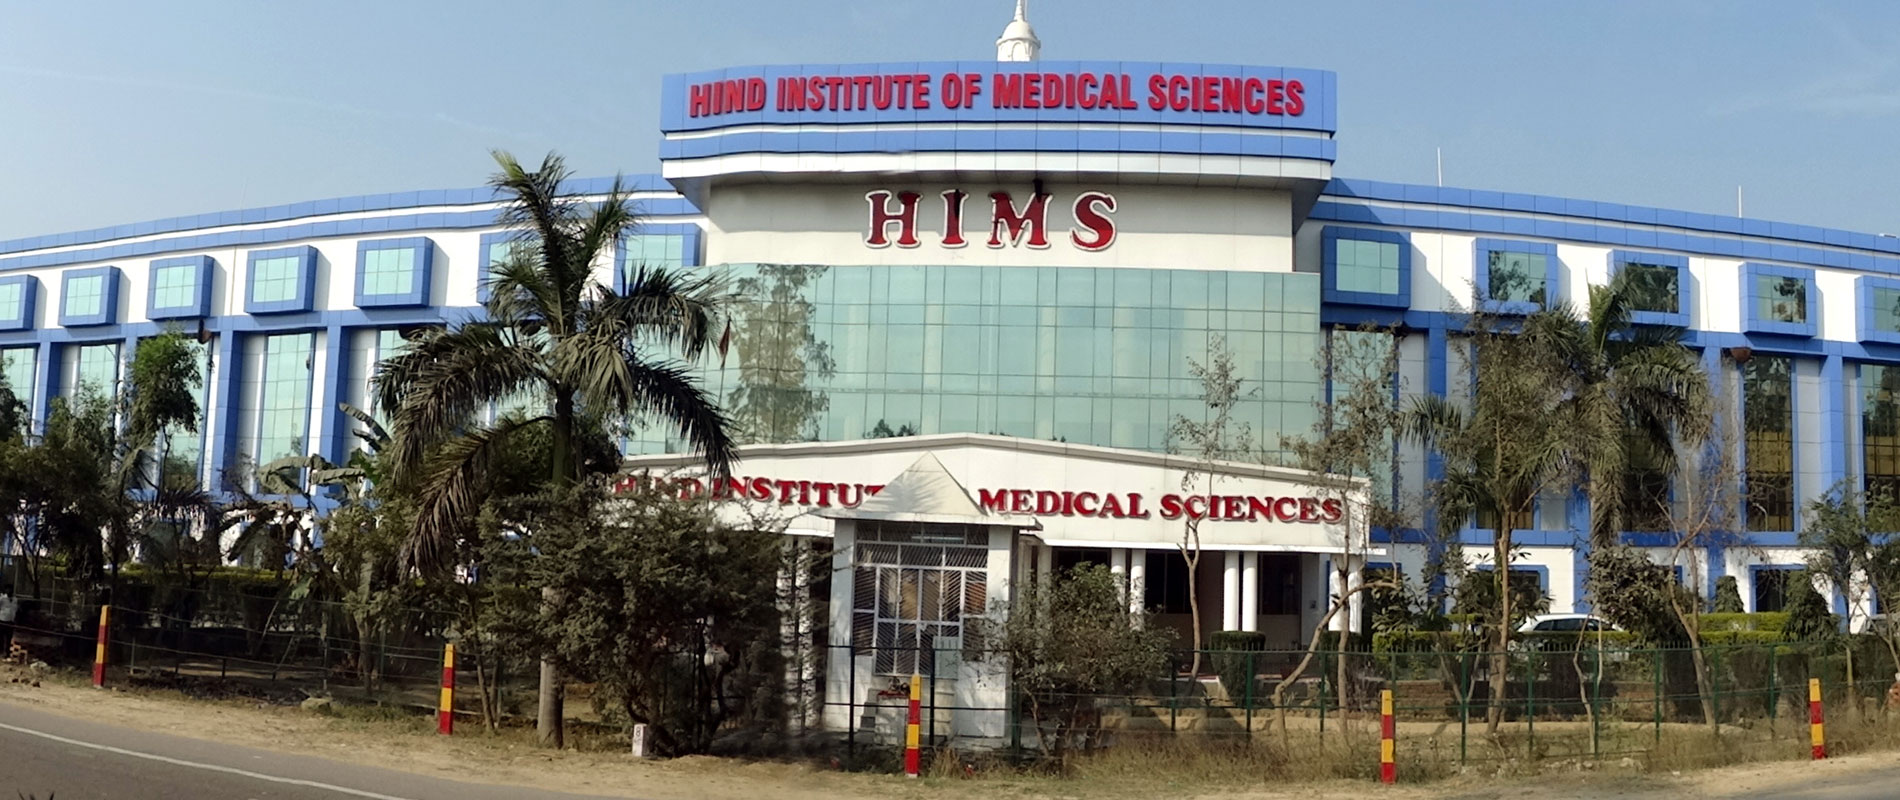 Hind Institute of Medical Sciences, Sitapur Image